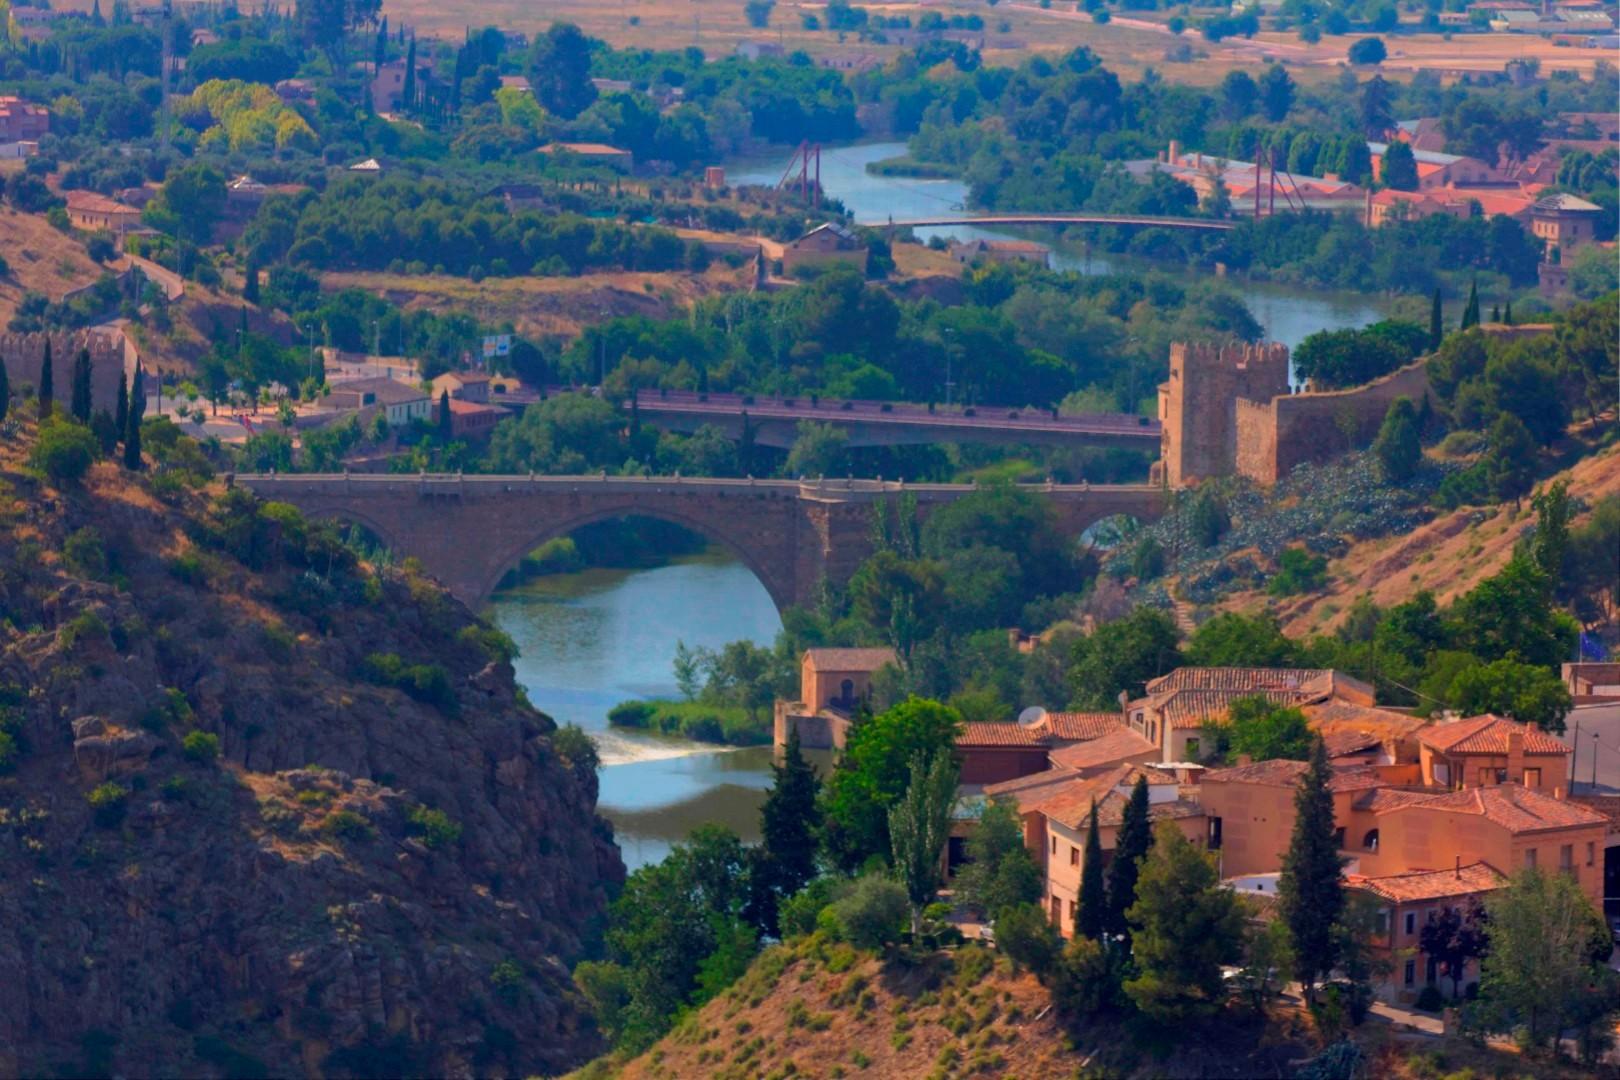 Toledo, Bridges, Tagus, Spain, Travelers Roundtable, Robert Bundy